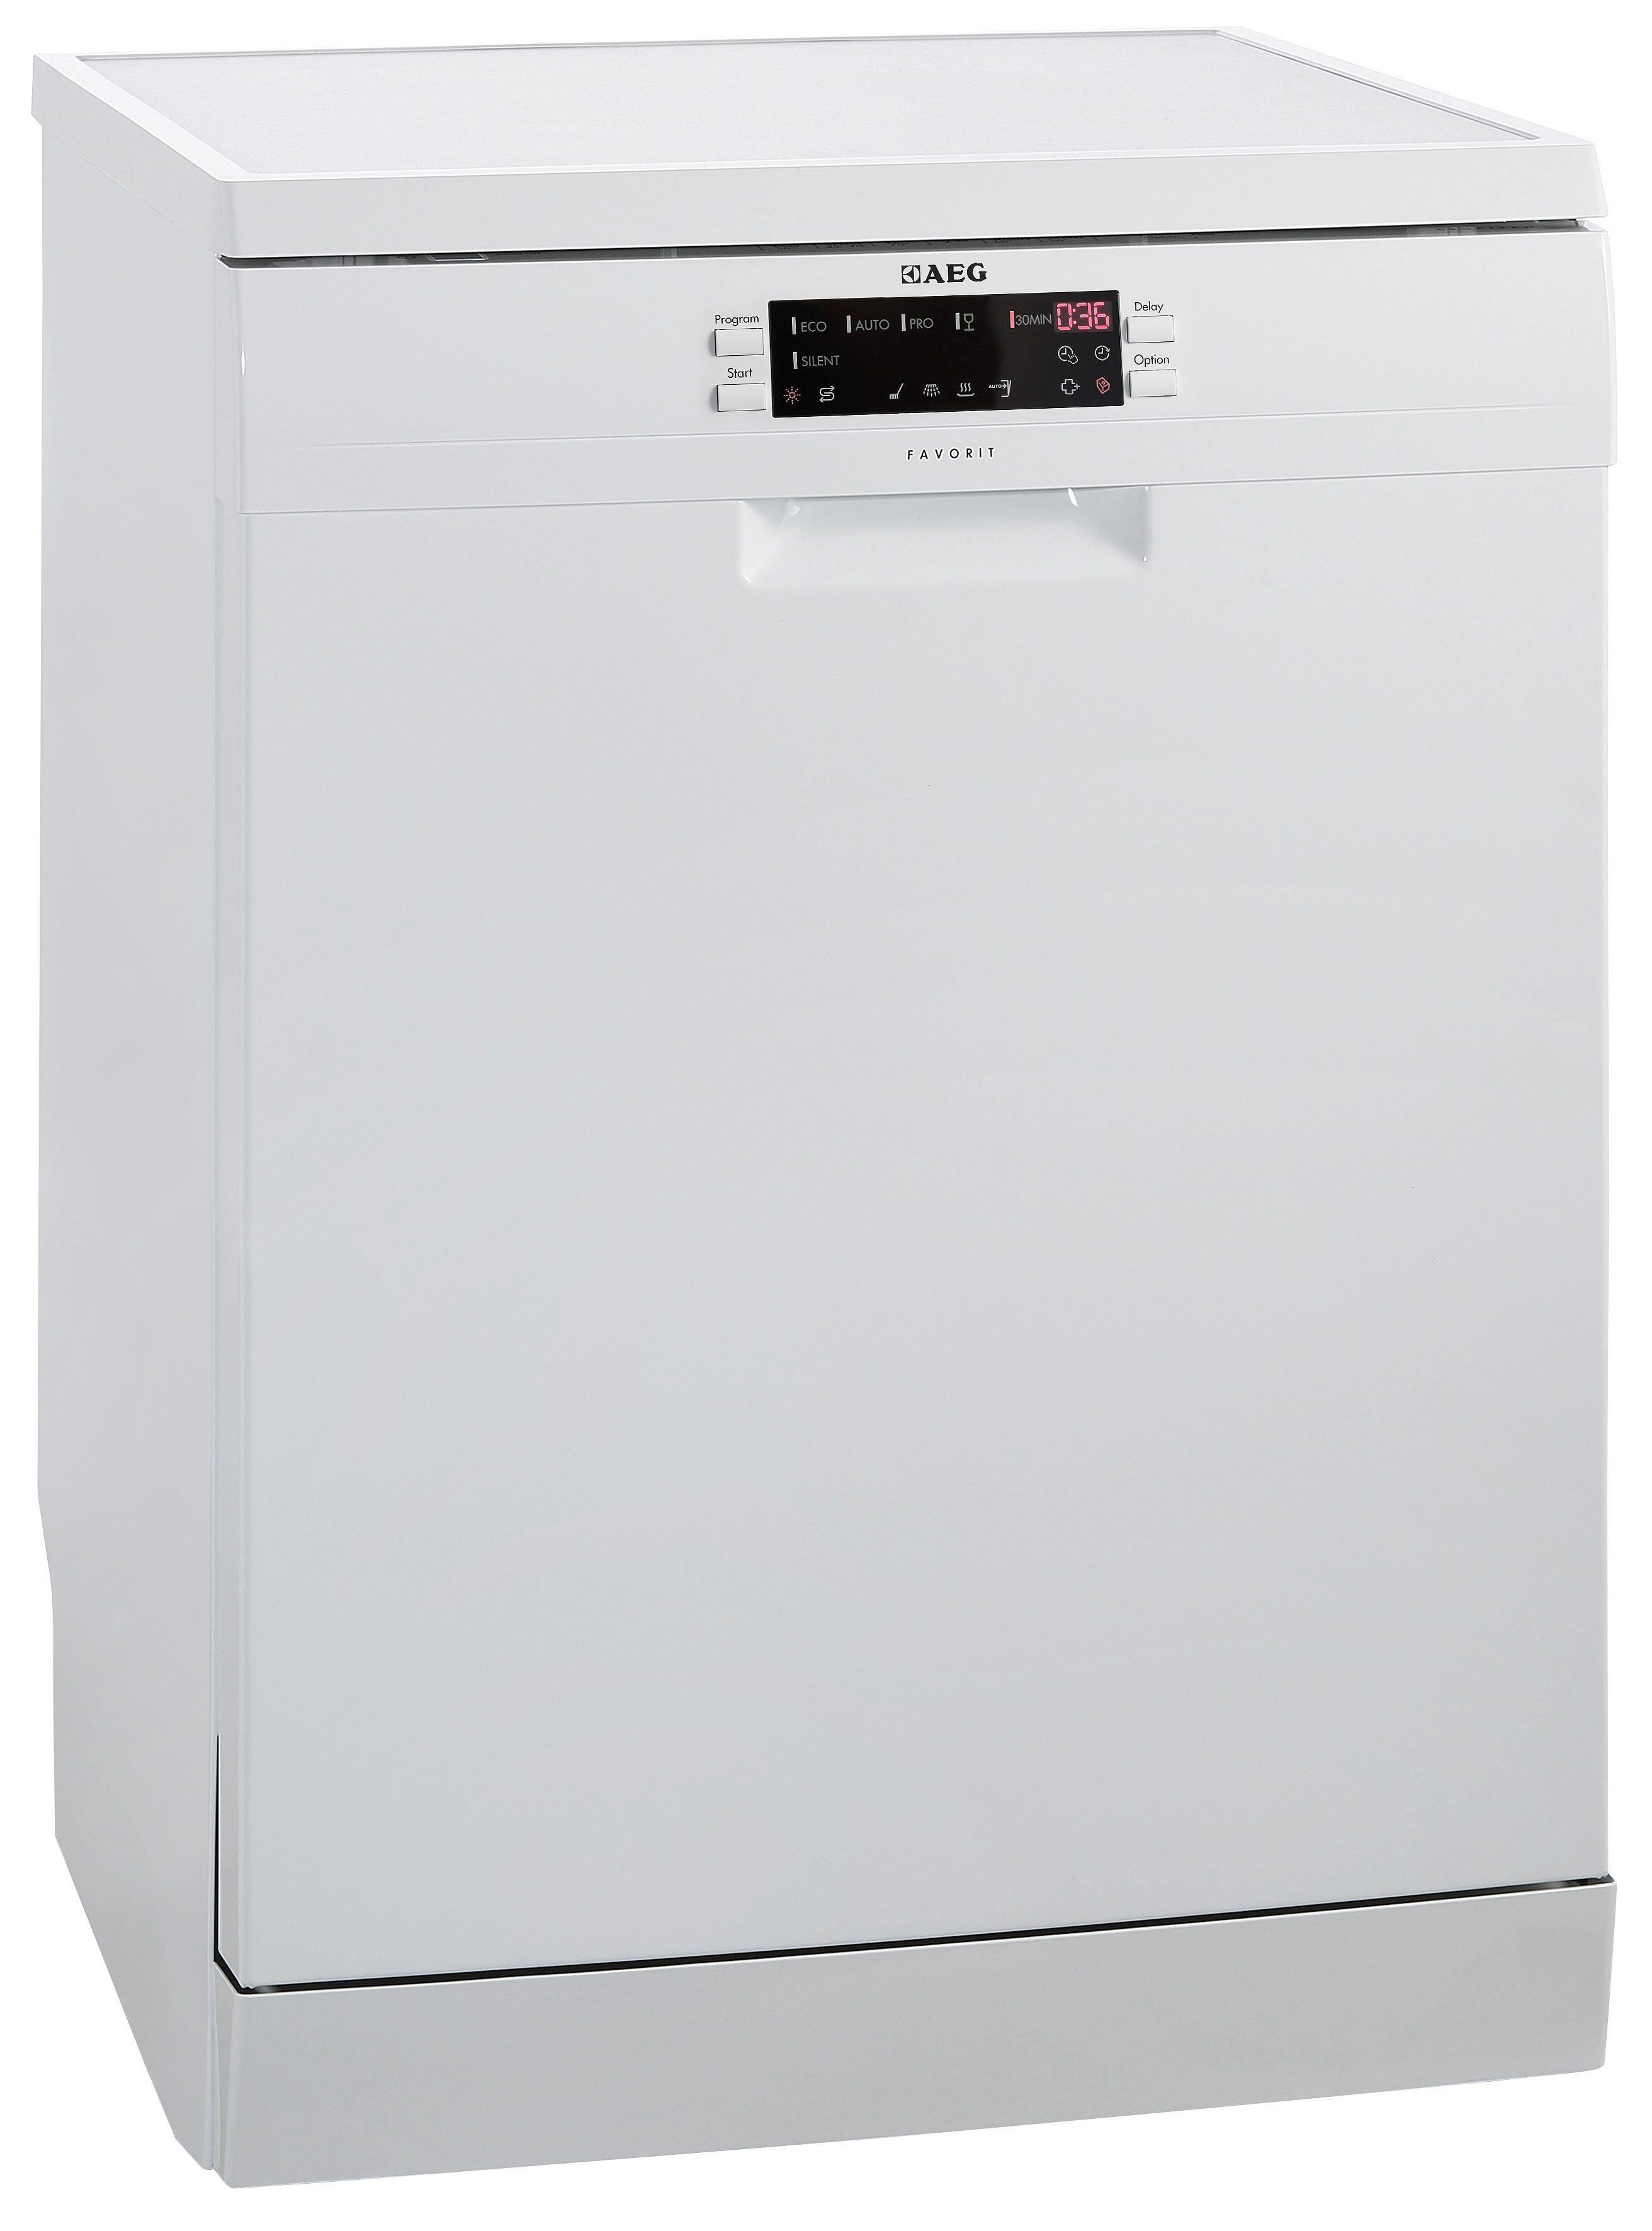 AEG Standgeschirrspüler FAVORIT F65712W0P, A+++, 11 Liter, 15 Maßgedecke